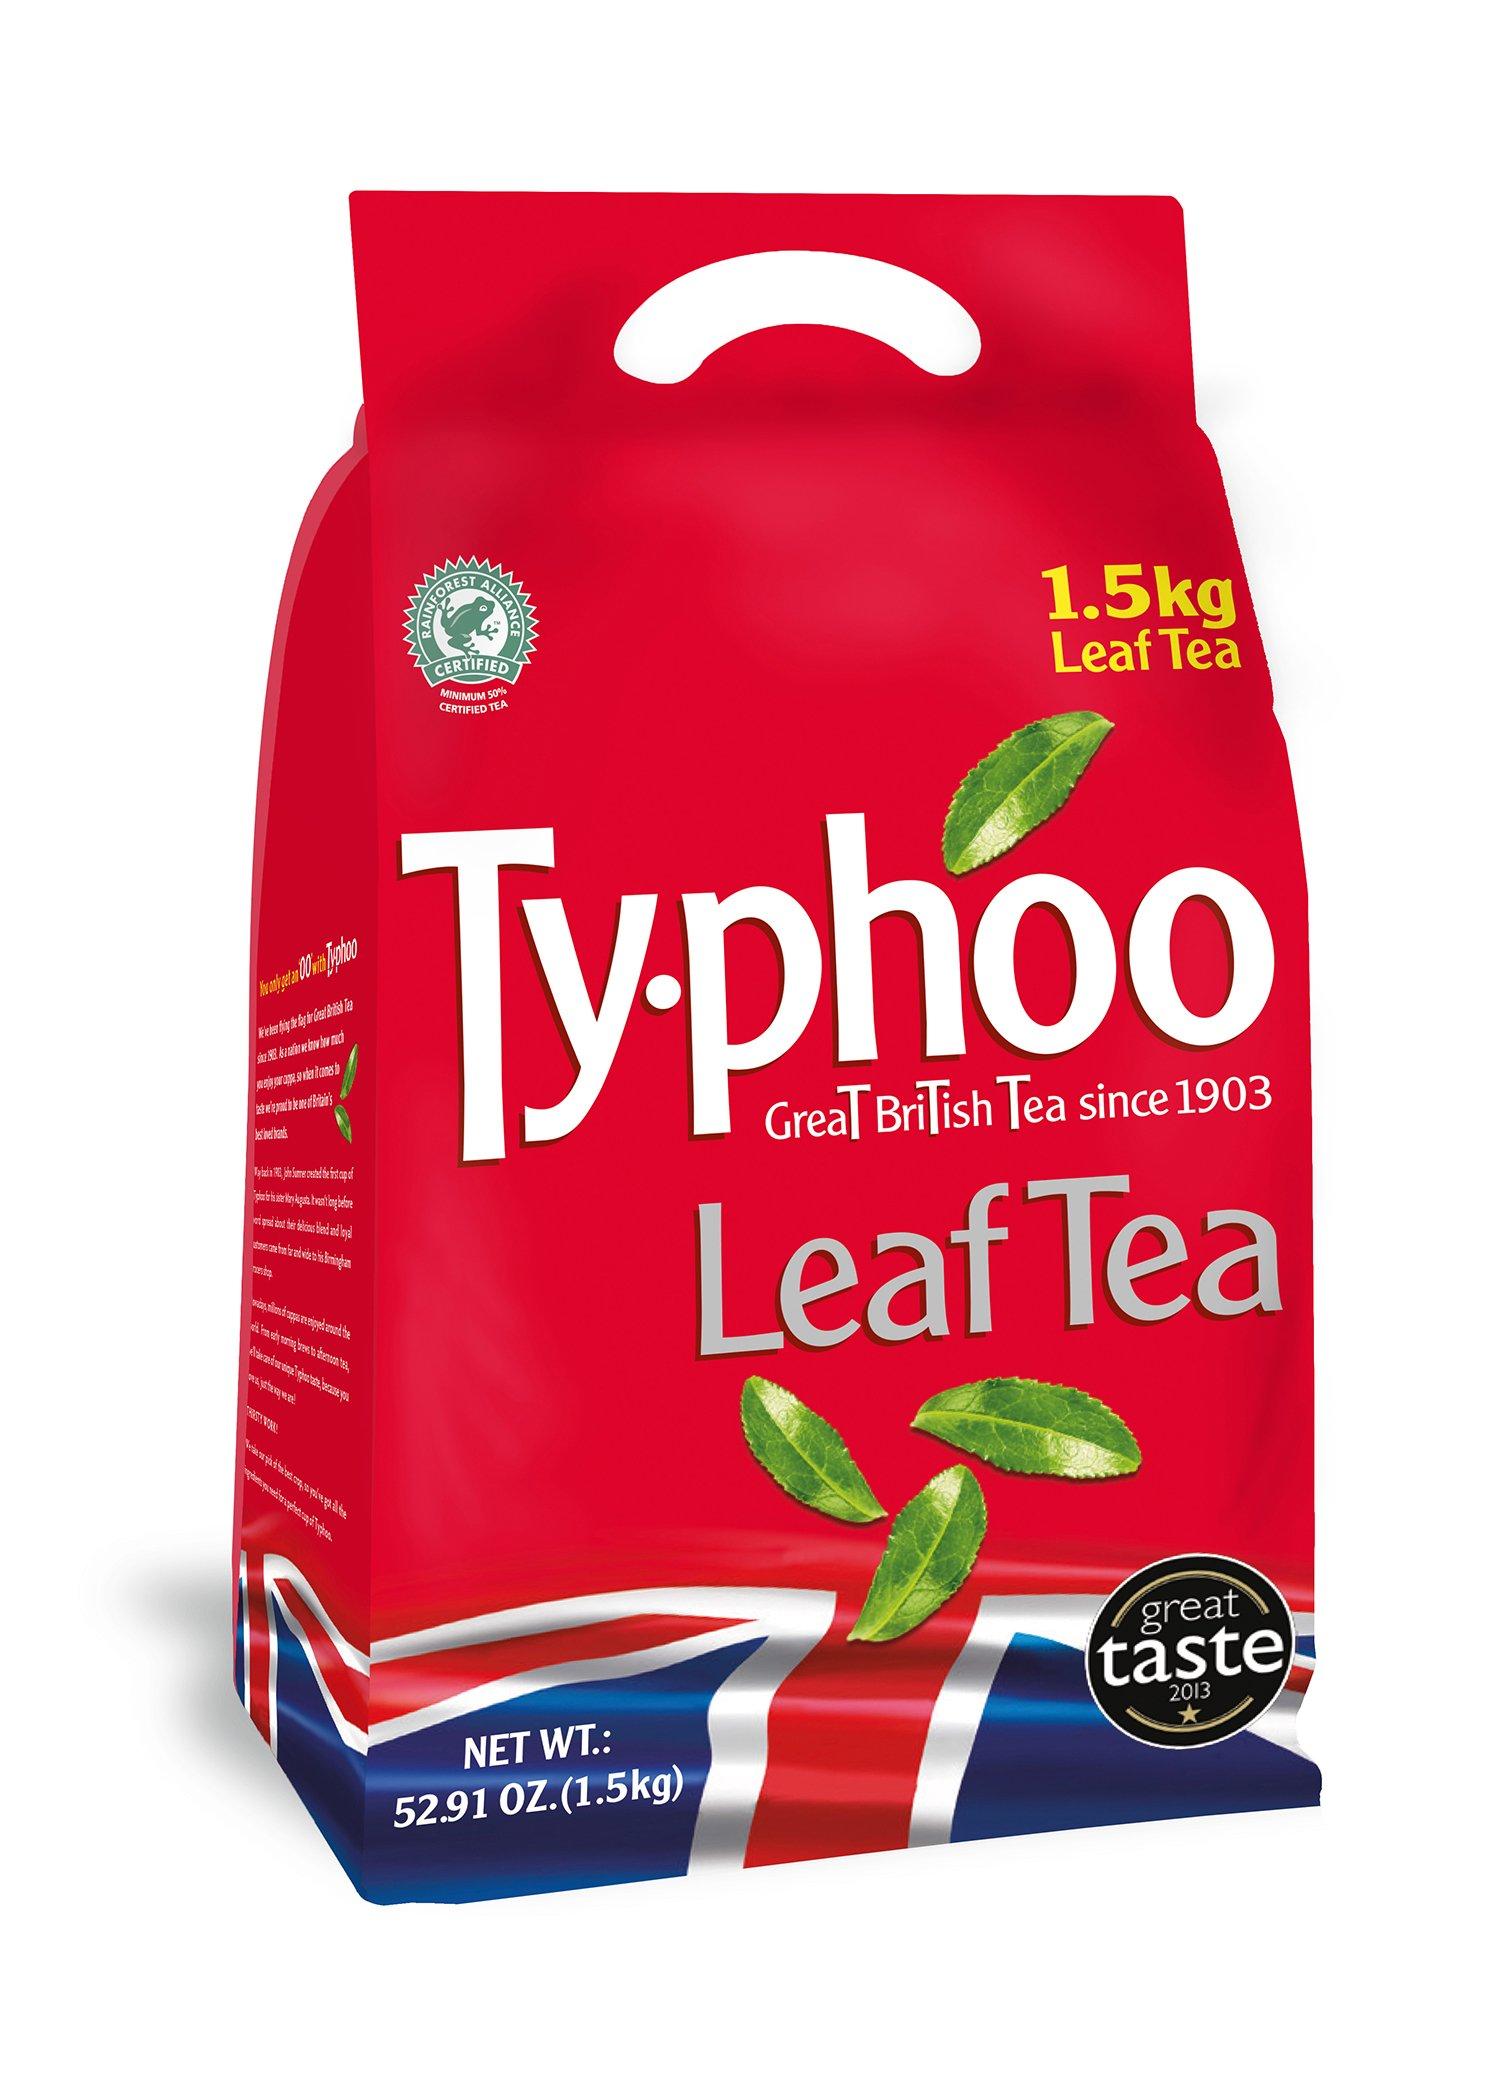 Typhoo tea bundle (rainforest alliance) (black tea) (4 packs of 1.5kg) (6kg) (brews in 3-5 minutes)